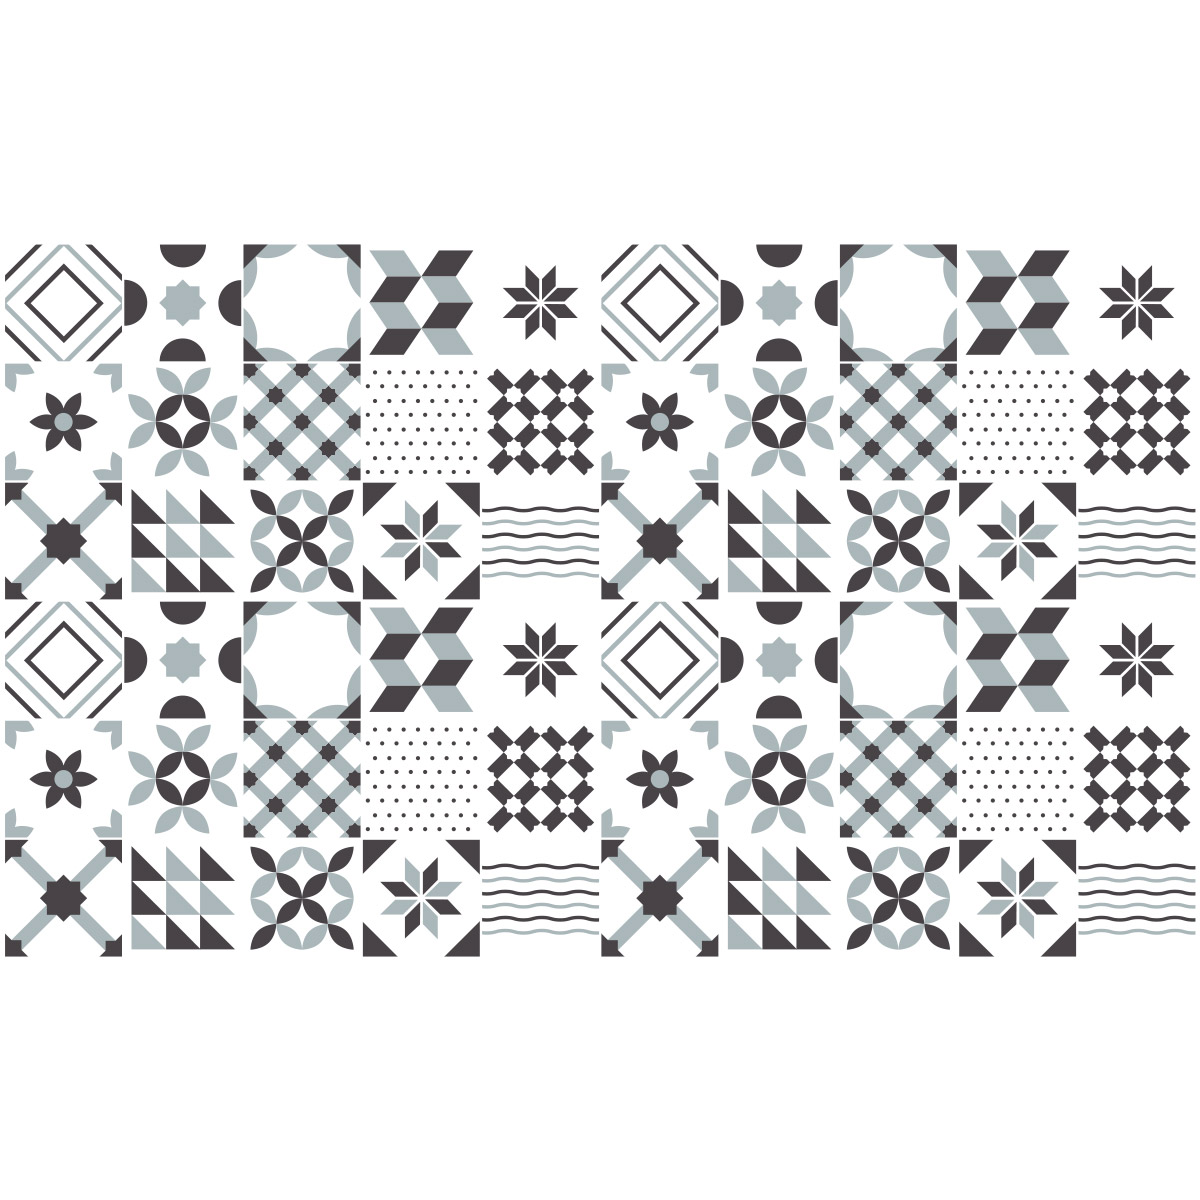 60 stickers carrelages azulejos g om triques nuance de gris art et design artistiques. Black Bedroom Furniture Sets. Home Design Ideas